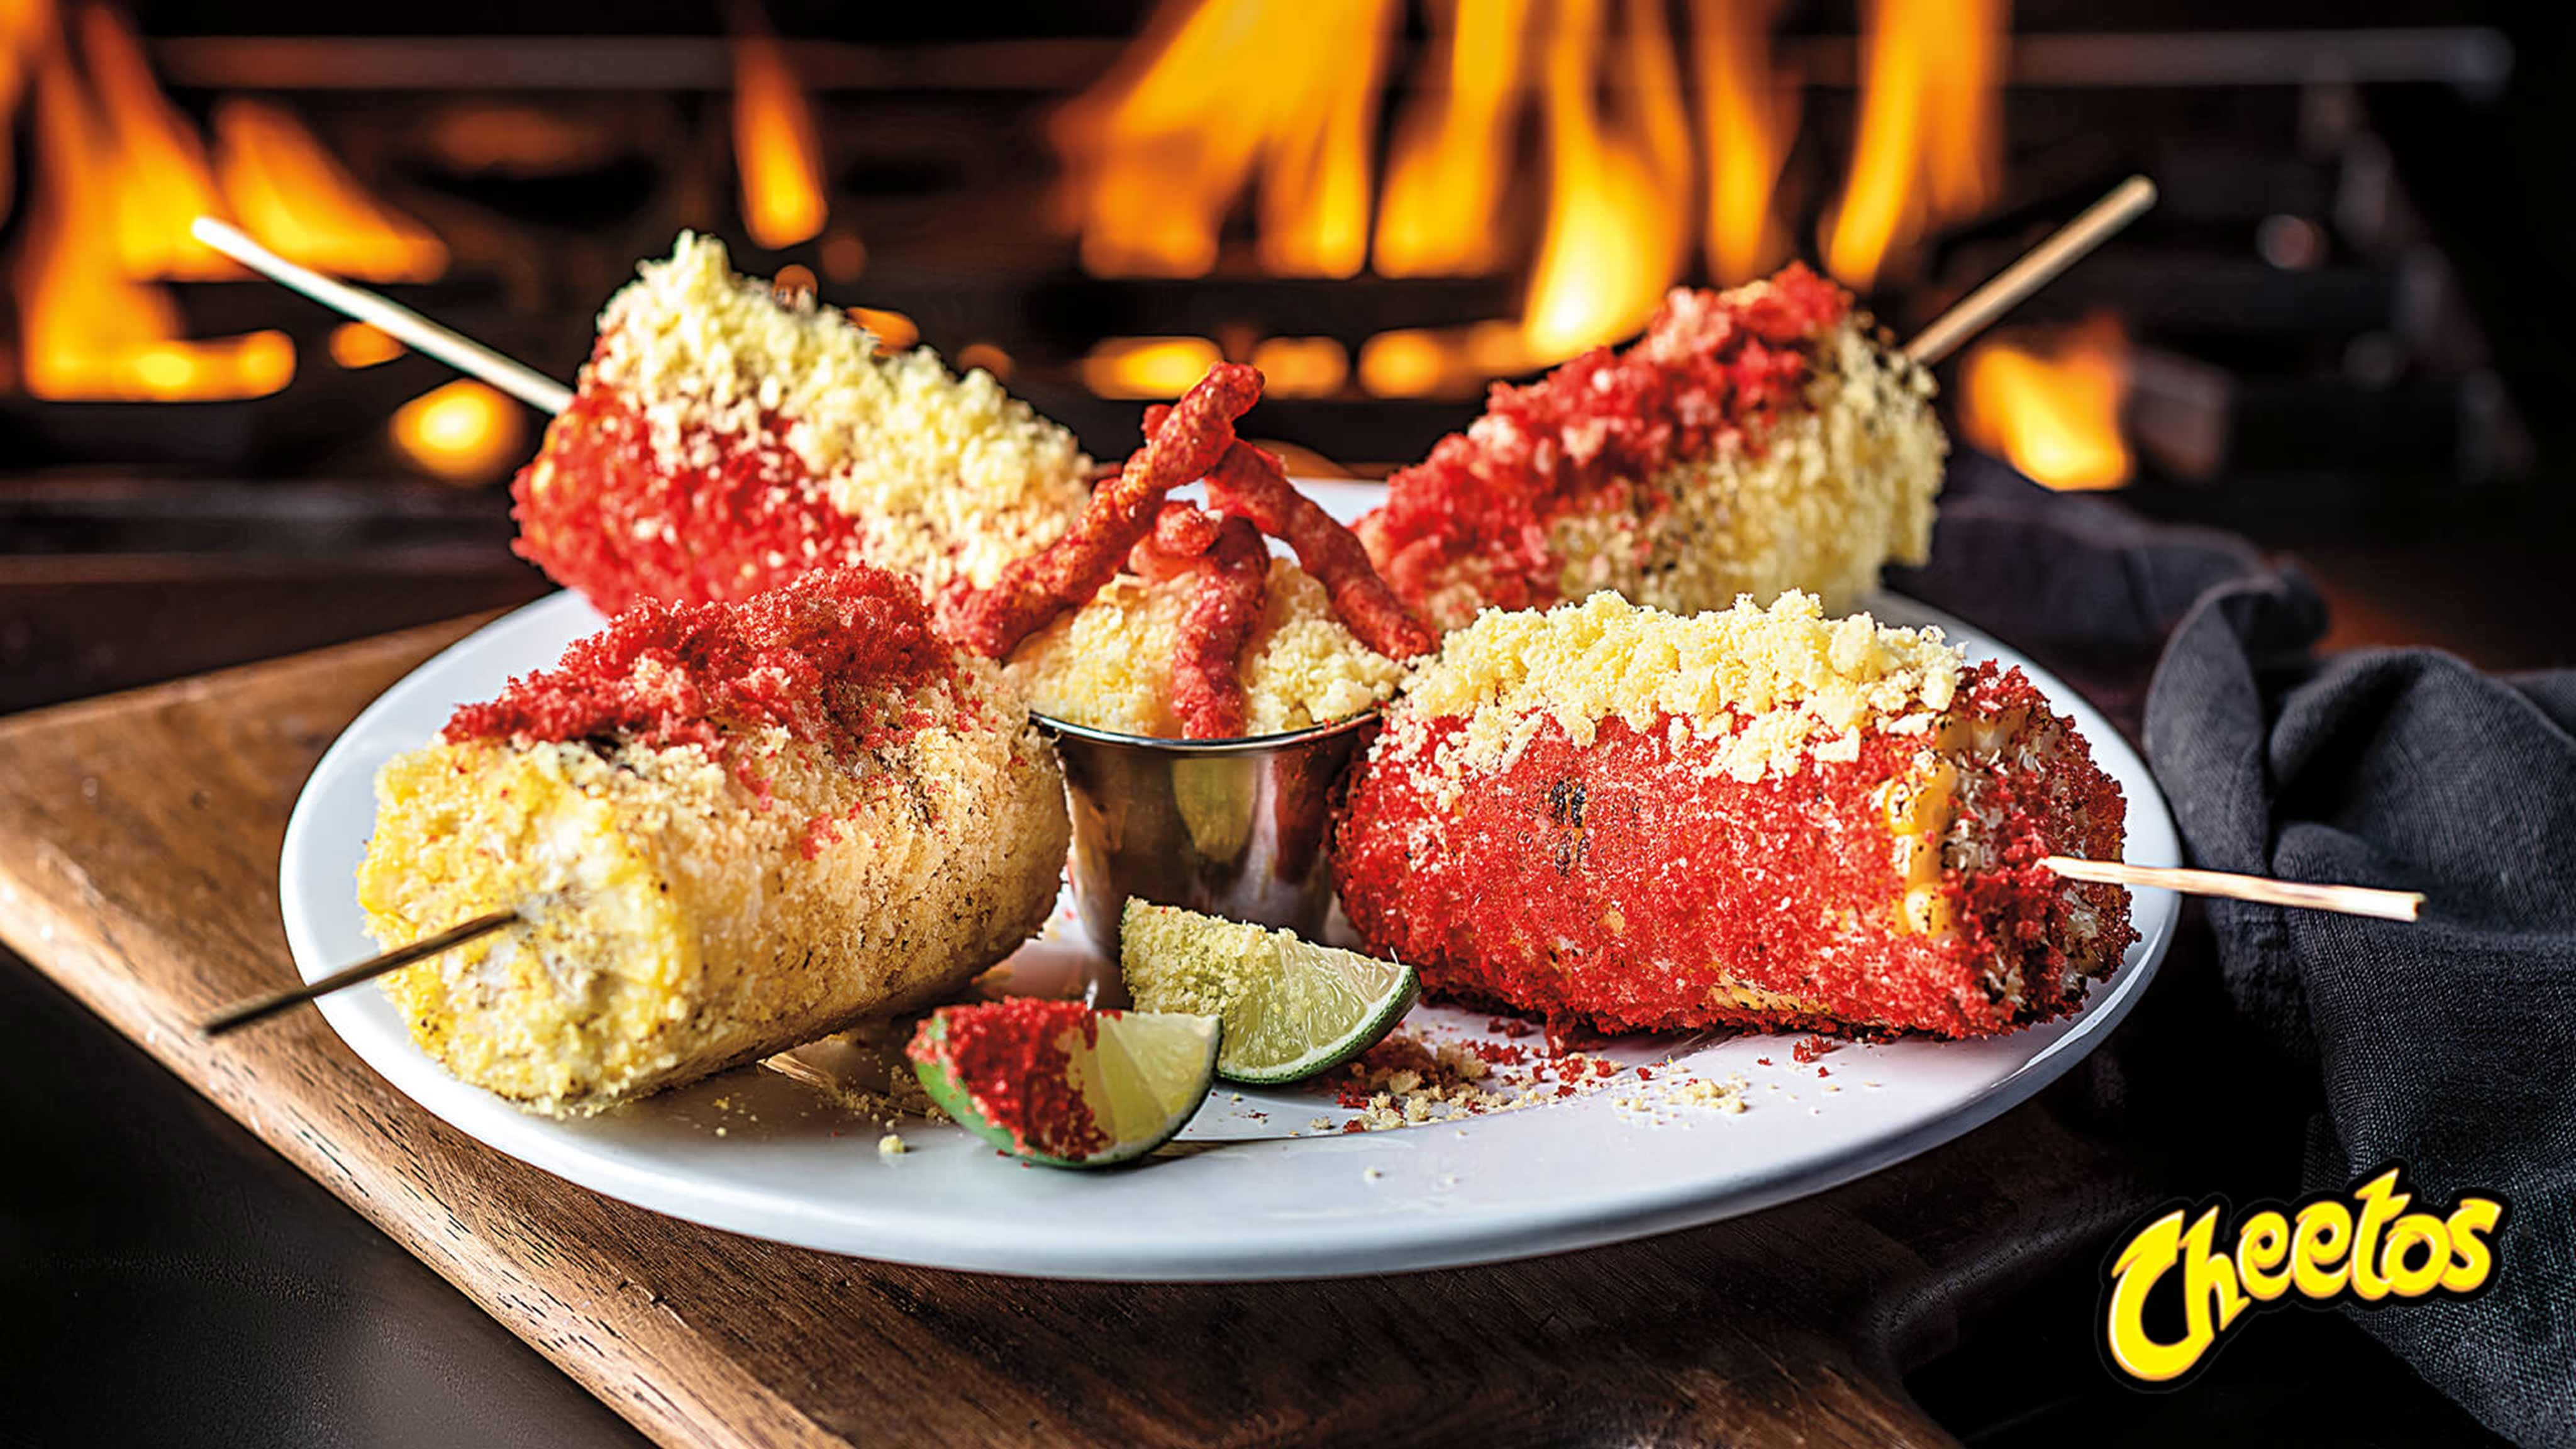 Image for Recipe CHEETOS Flamin Hot Elotes